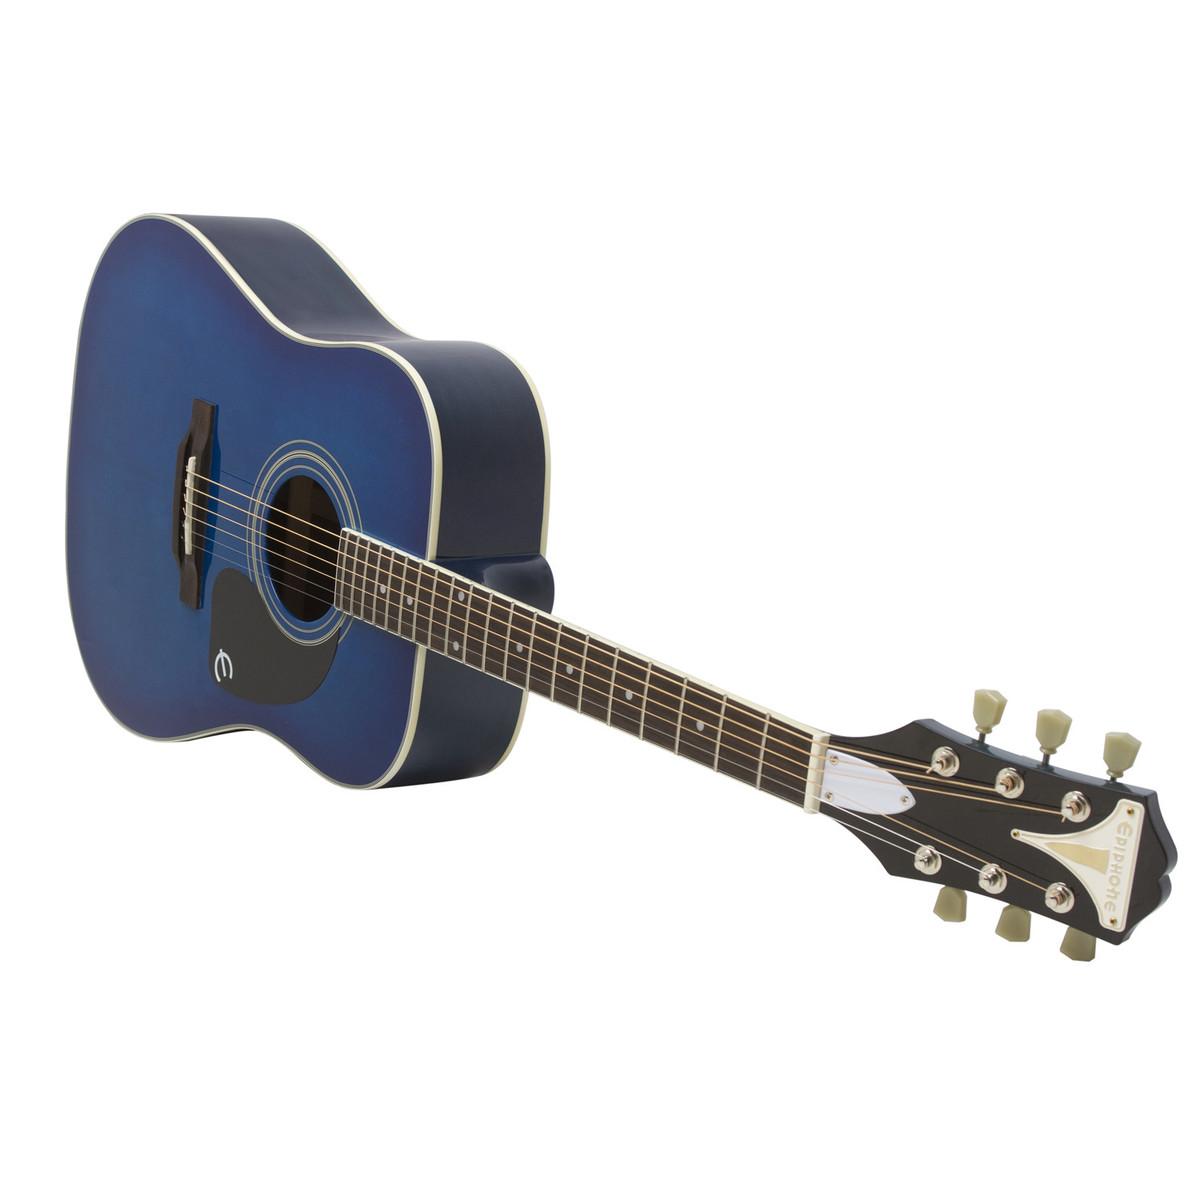 epiphone pro 1 plus acoustic trans blue at. Black Bedroom Furniture Sets. Home Design Ideas